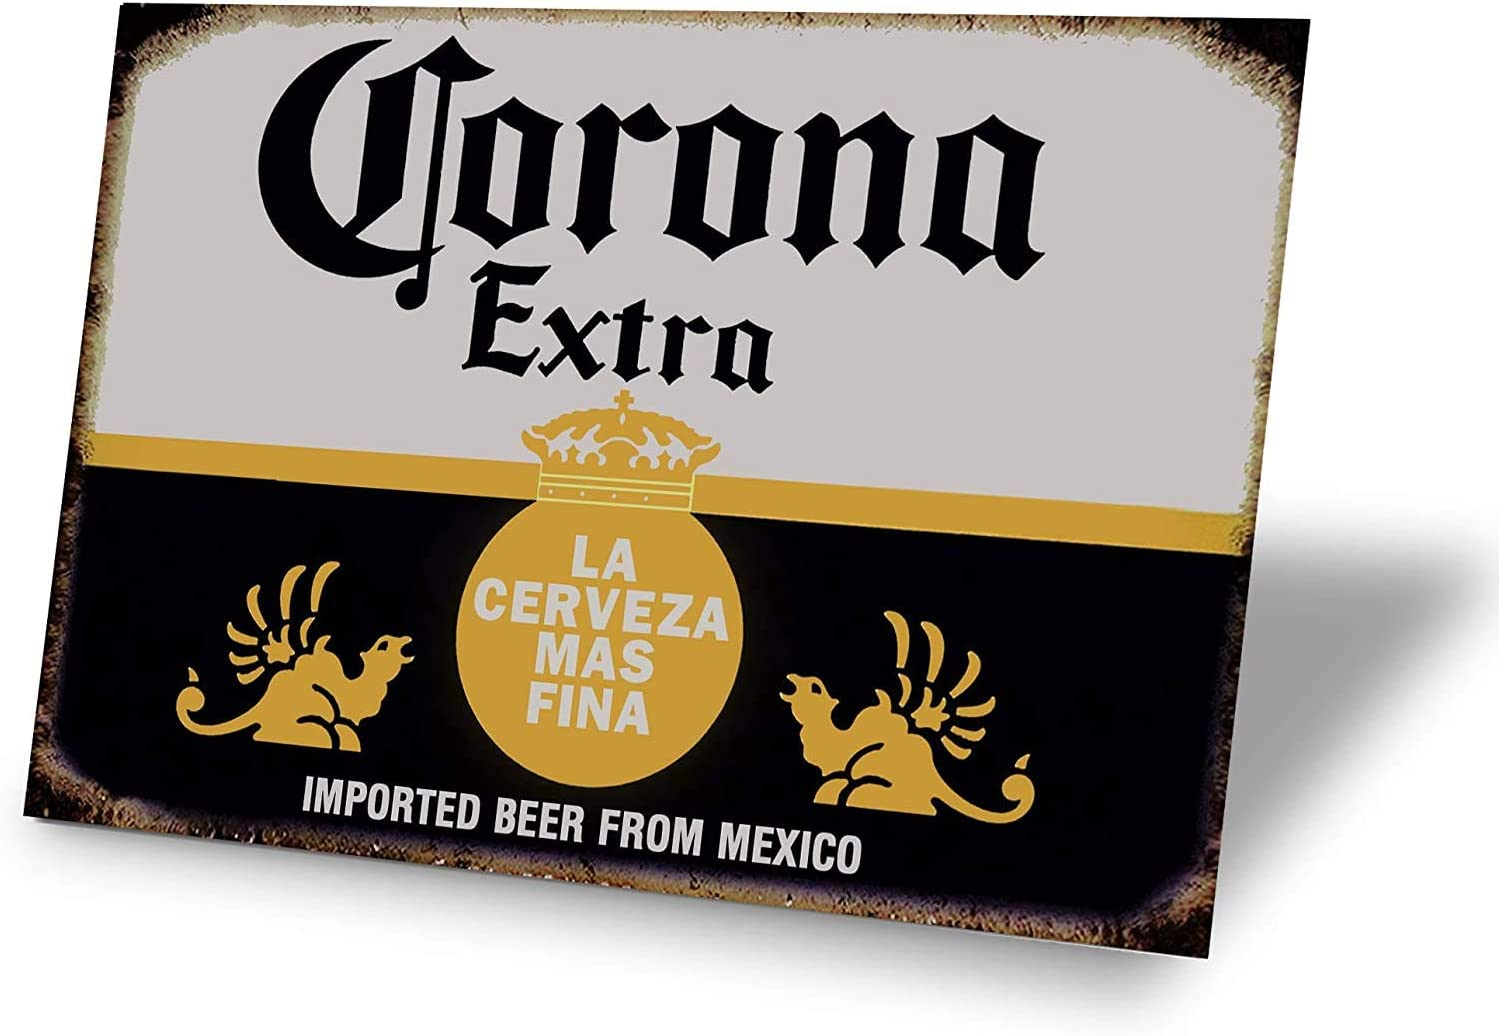 MUPIANLX Retro Vintage Tin Sign, Corona Beer from Mexico, Home Bar Man Cave Decor, 8